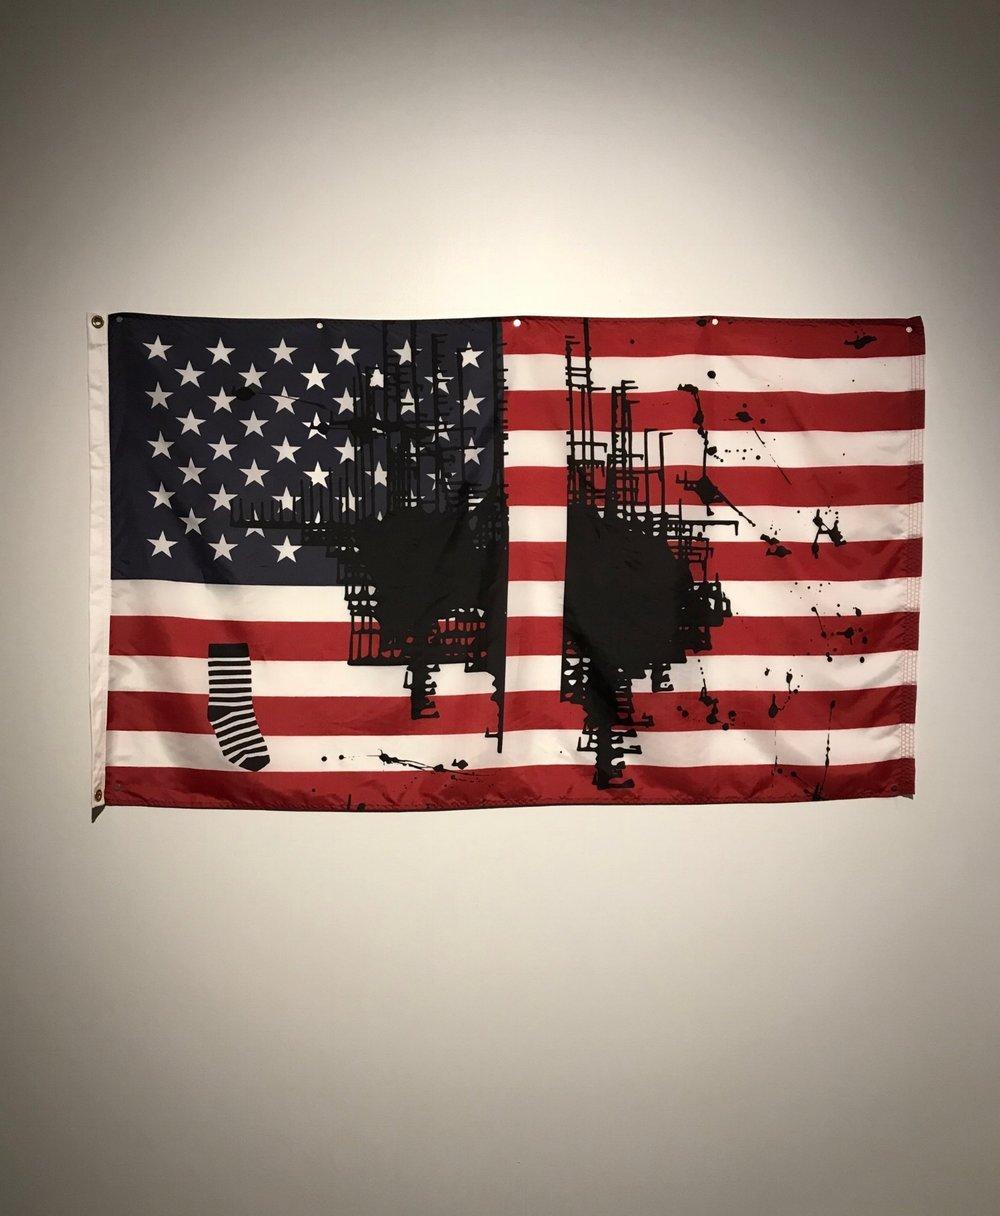 Untitled (Flag 2) | Artist: Josephine Meckseper | The Spencer Museum of Art at the University of Kansas | Photo by: David Tamez (2018)